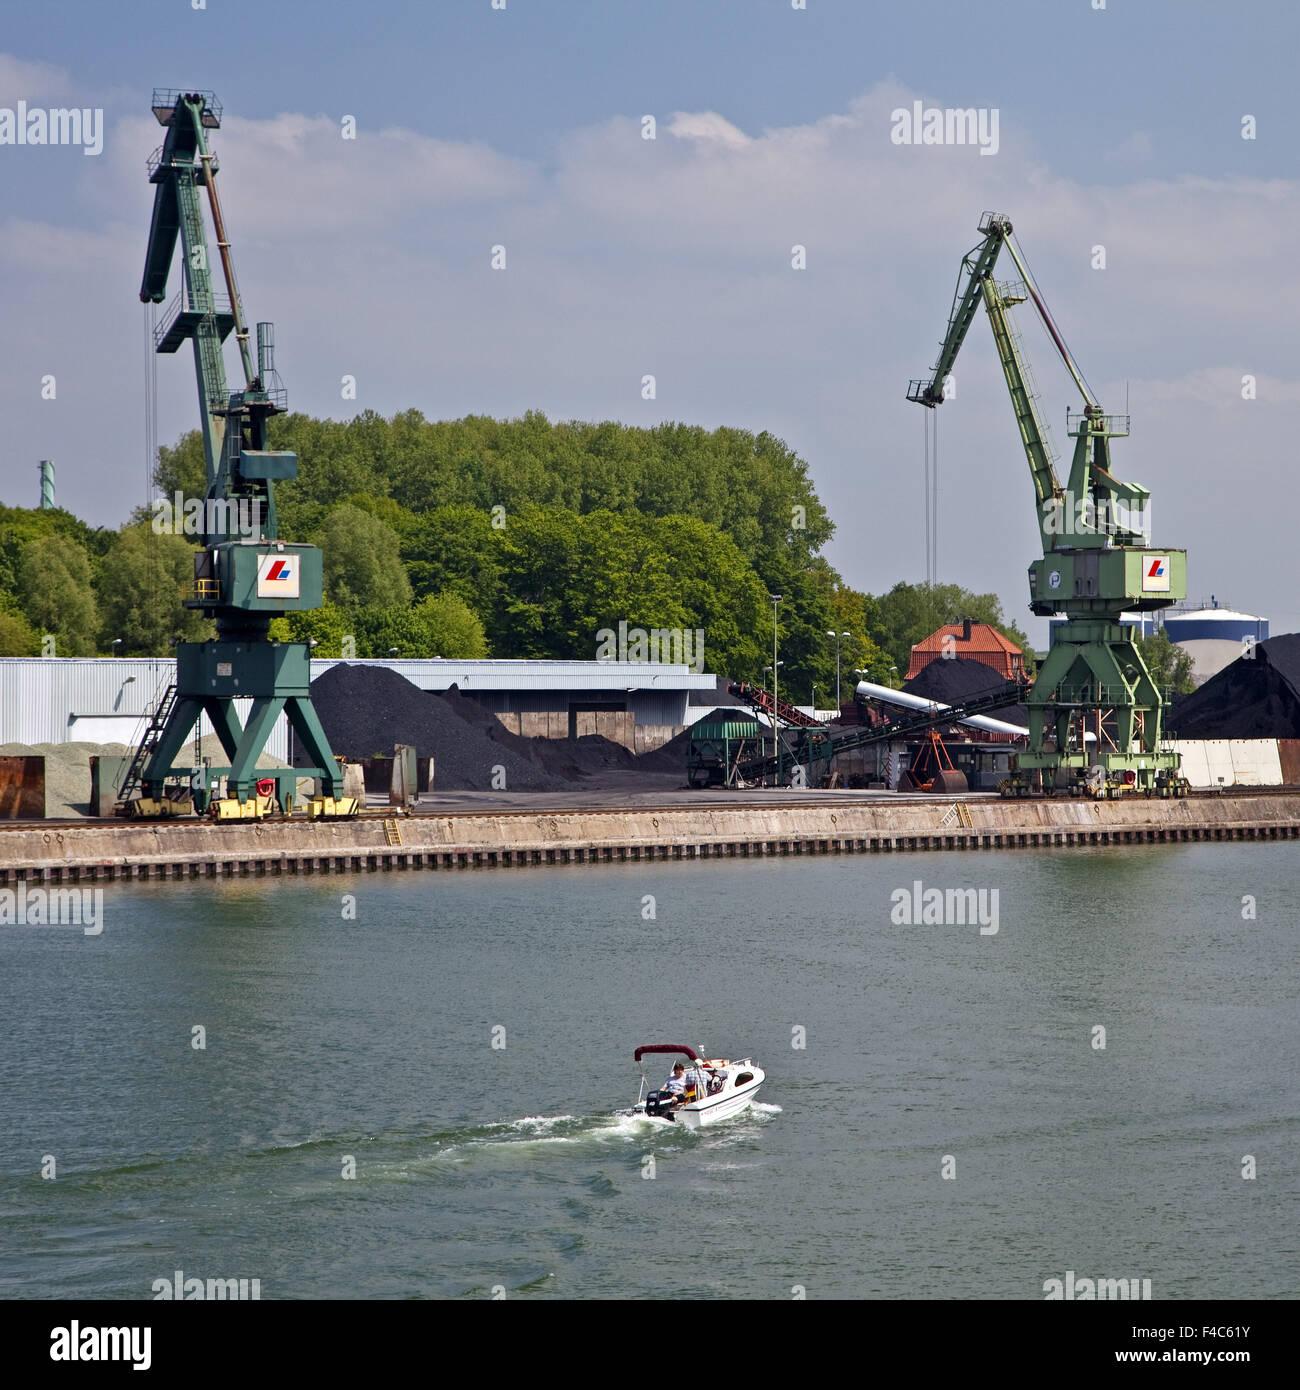 City harbor, Luenen, Germany - Stock Image